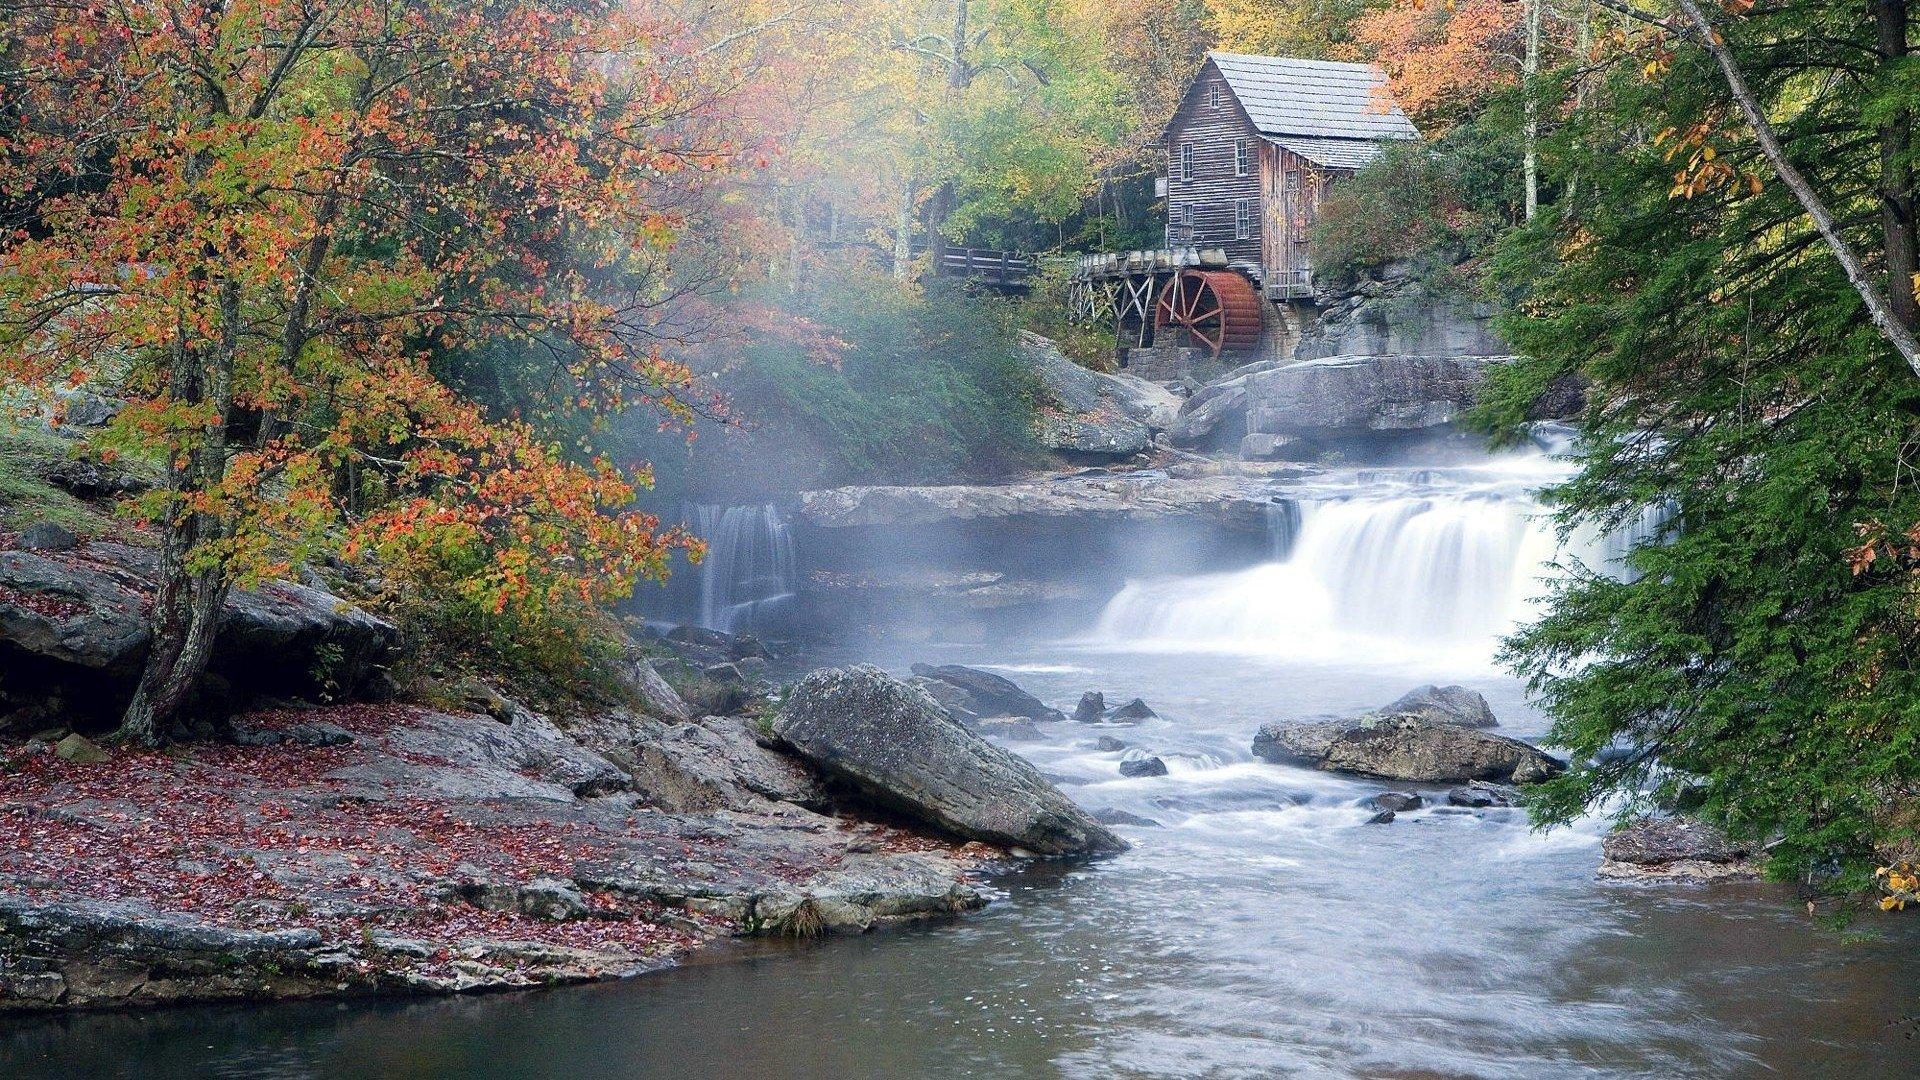 West Virginia Wallpaper Image